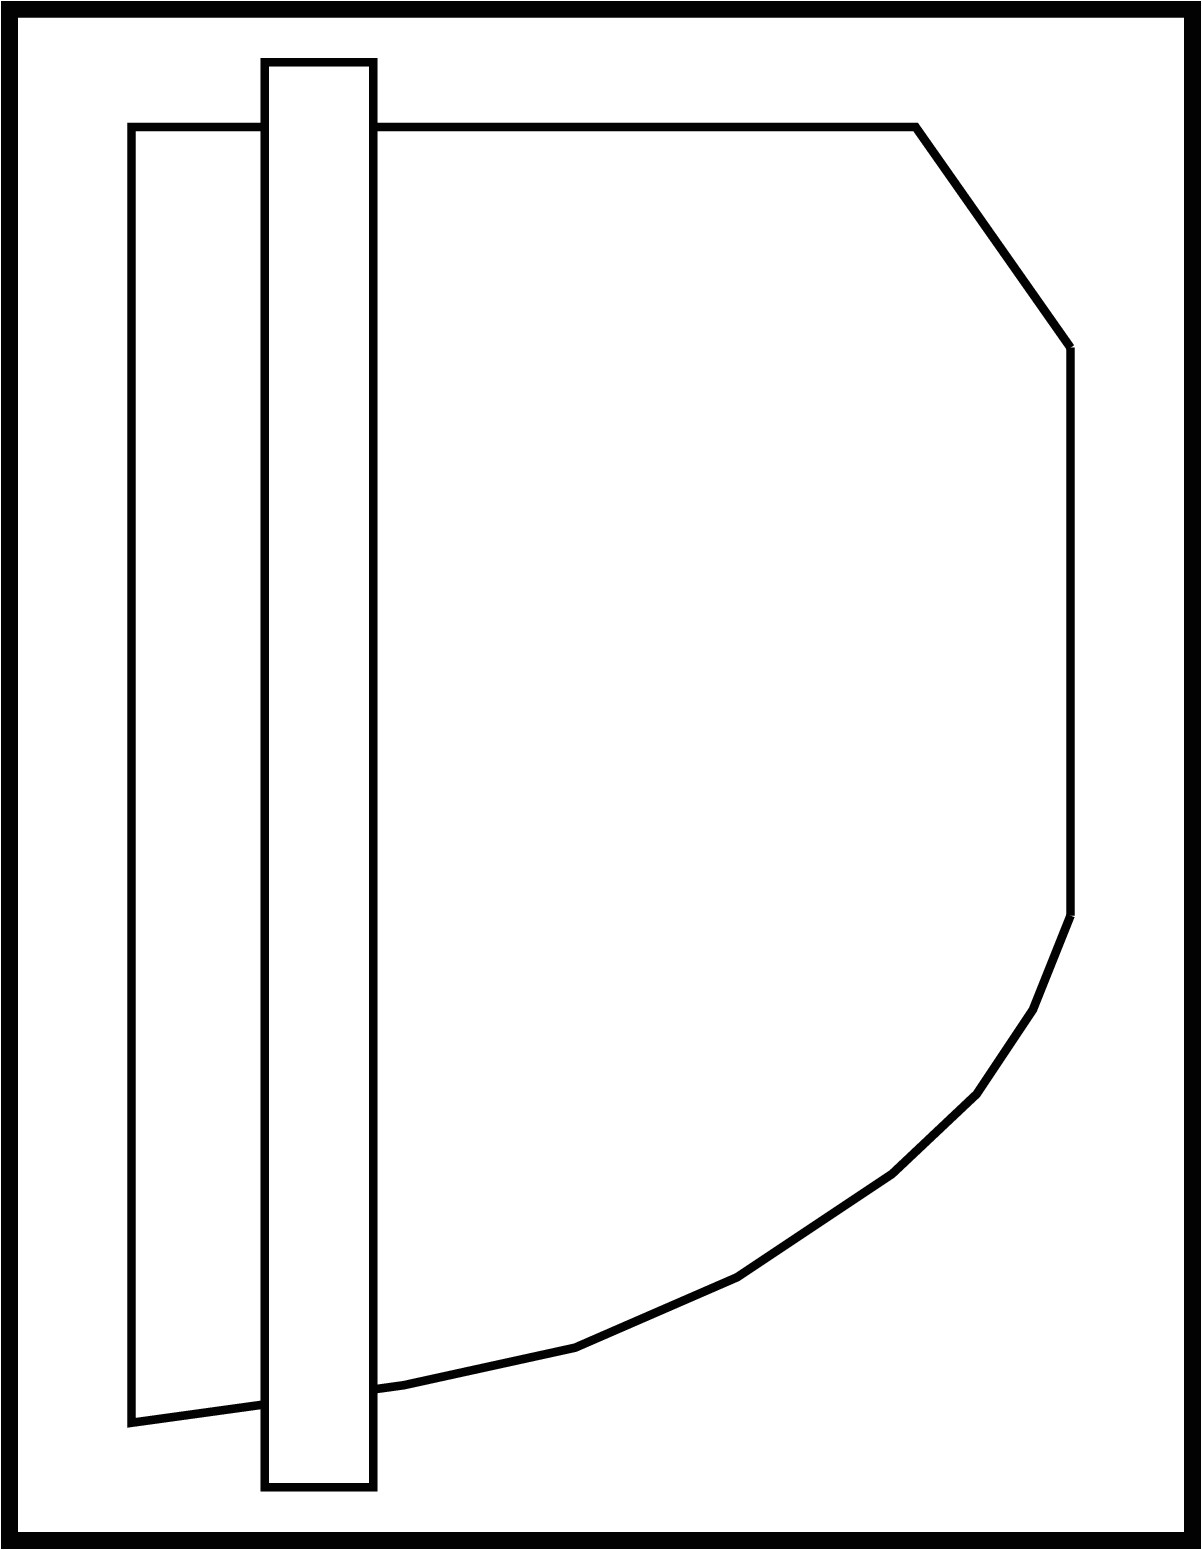 Avery Binder Cover Templates Free Avery Designer View Binder Spine Digital Smoke 18600